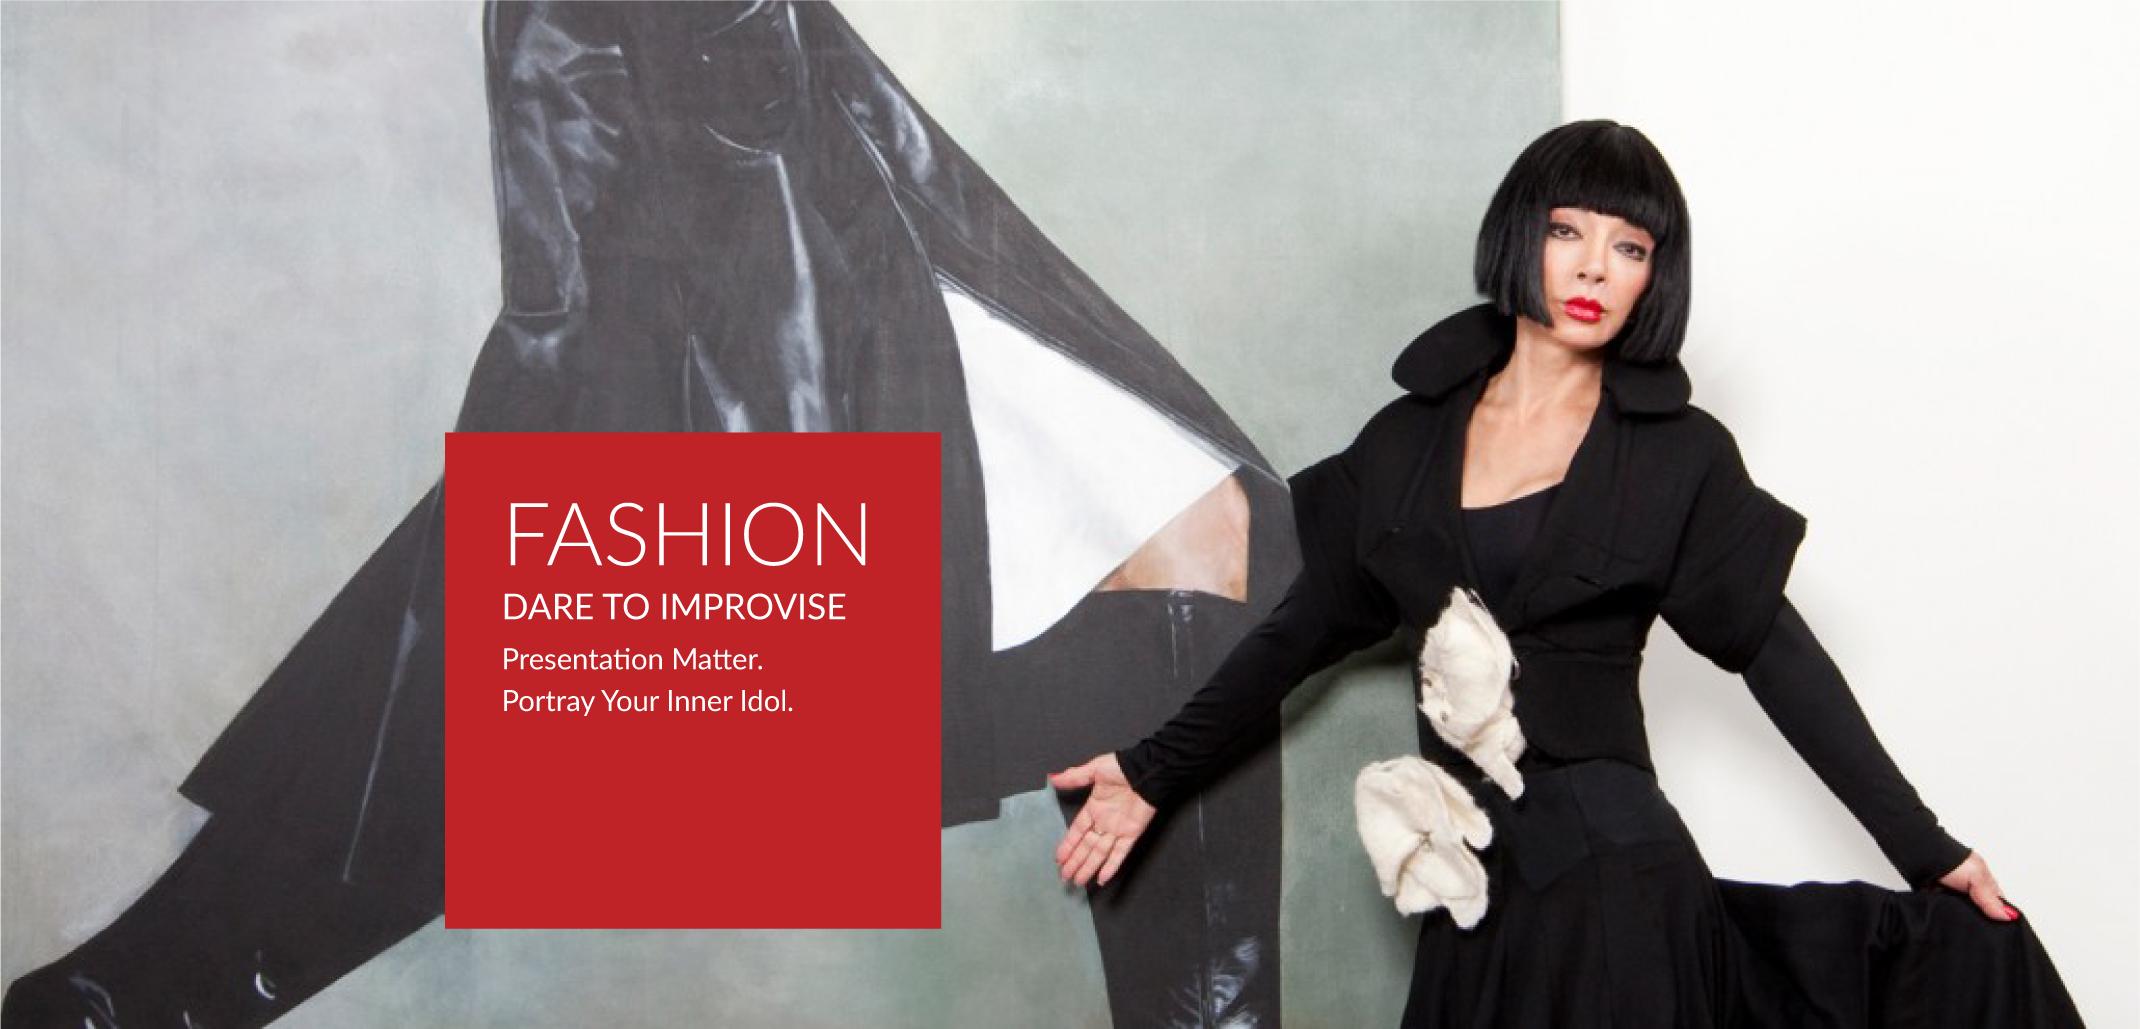 Homiera-Fashion-Dare-to-Improvise.jpg